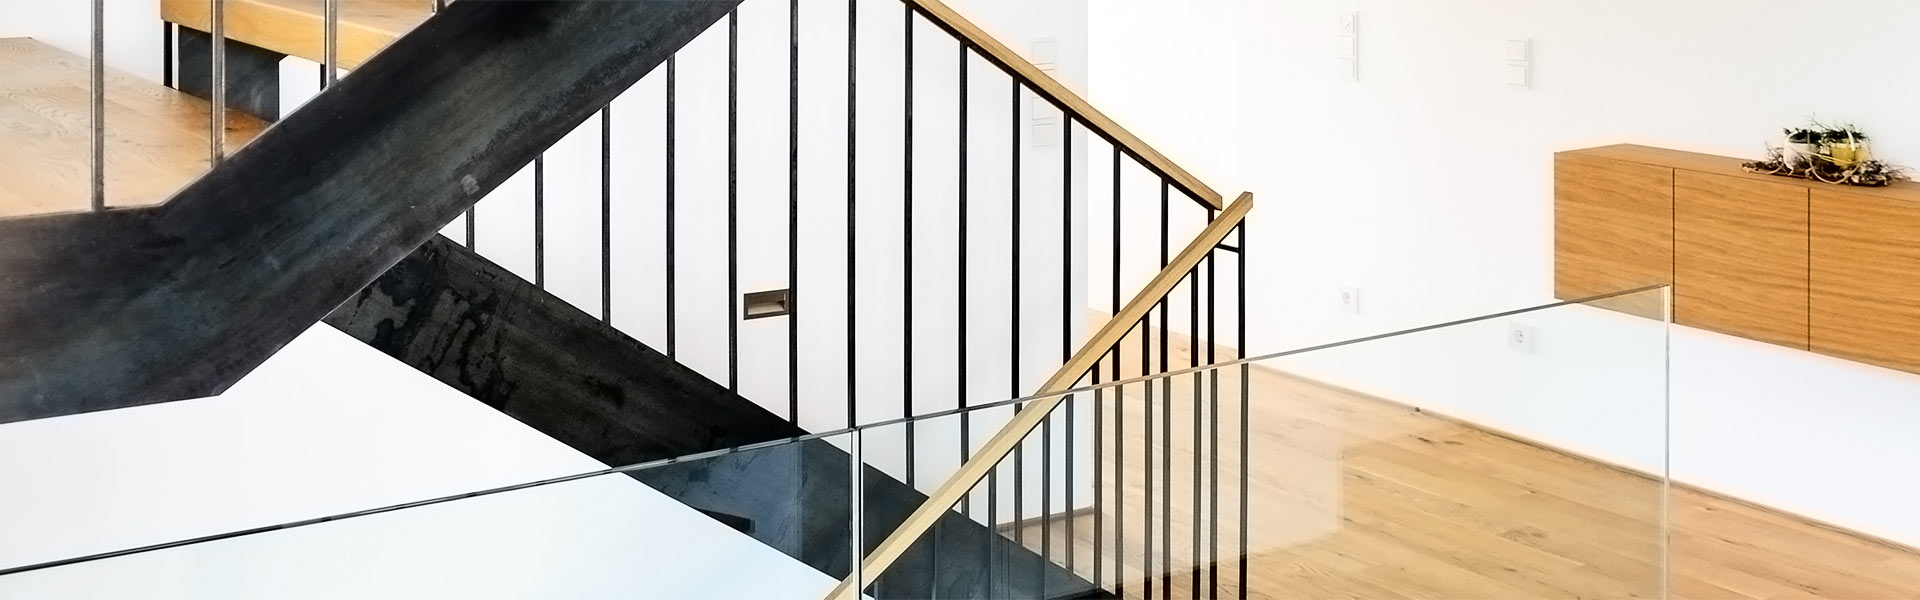 Holzhaus: schlüsselfertig & modern